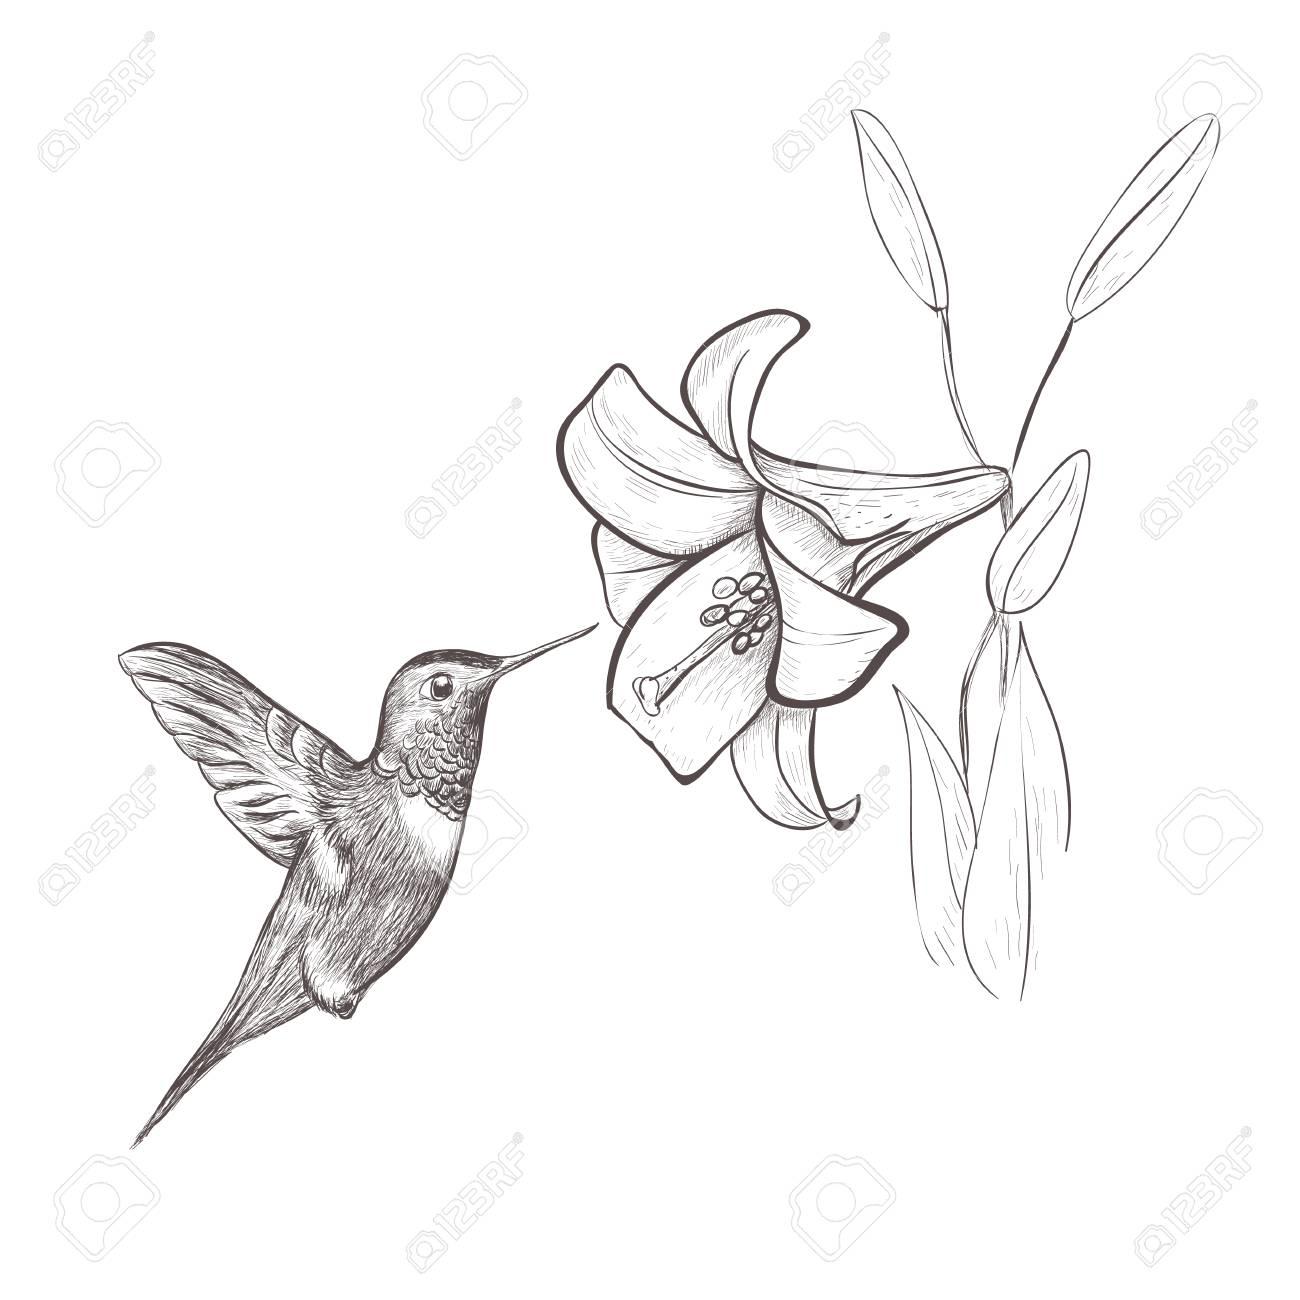 1300x1300 Hummingbird Bird Nectar Flower. Hummingbird And Lily Hand Drawing